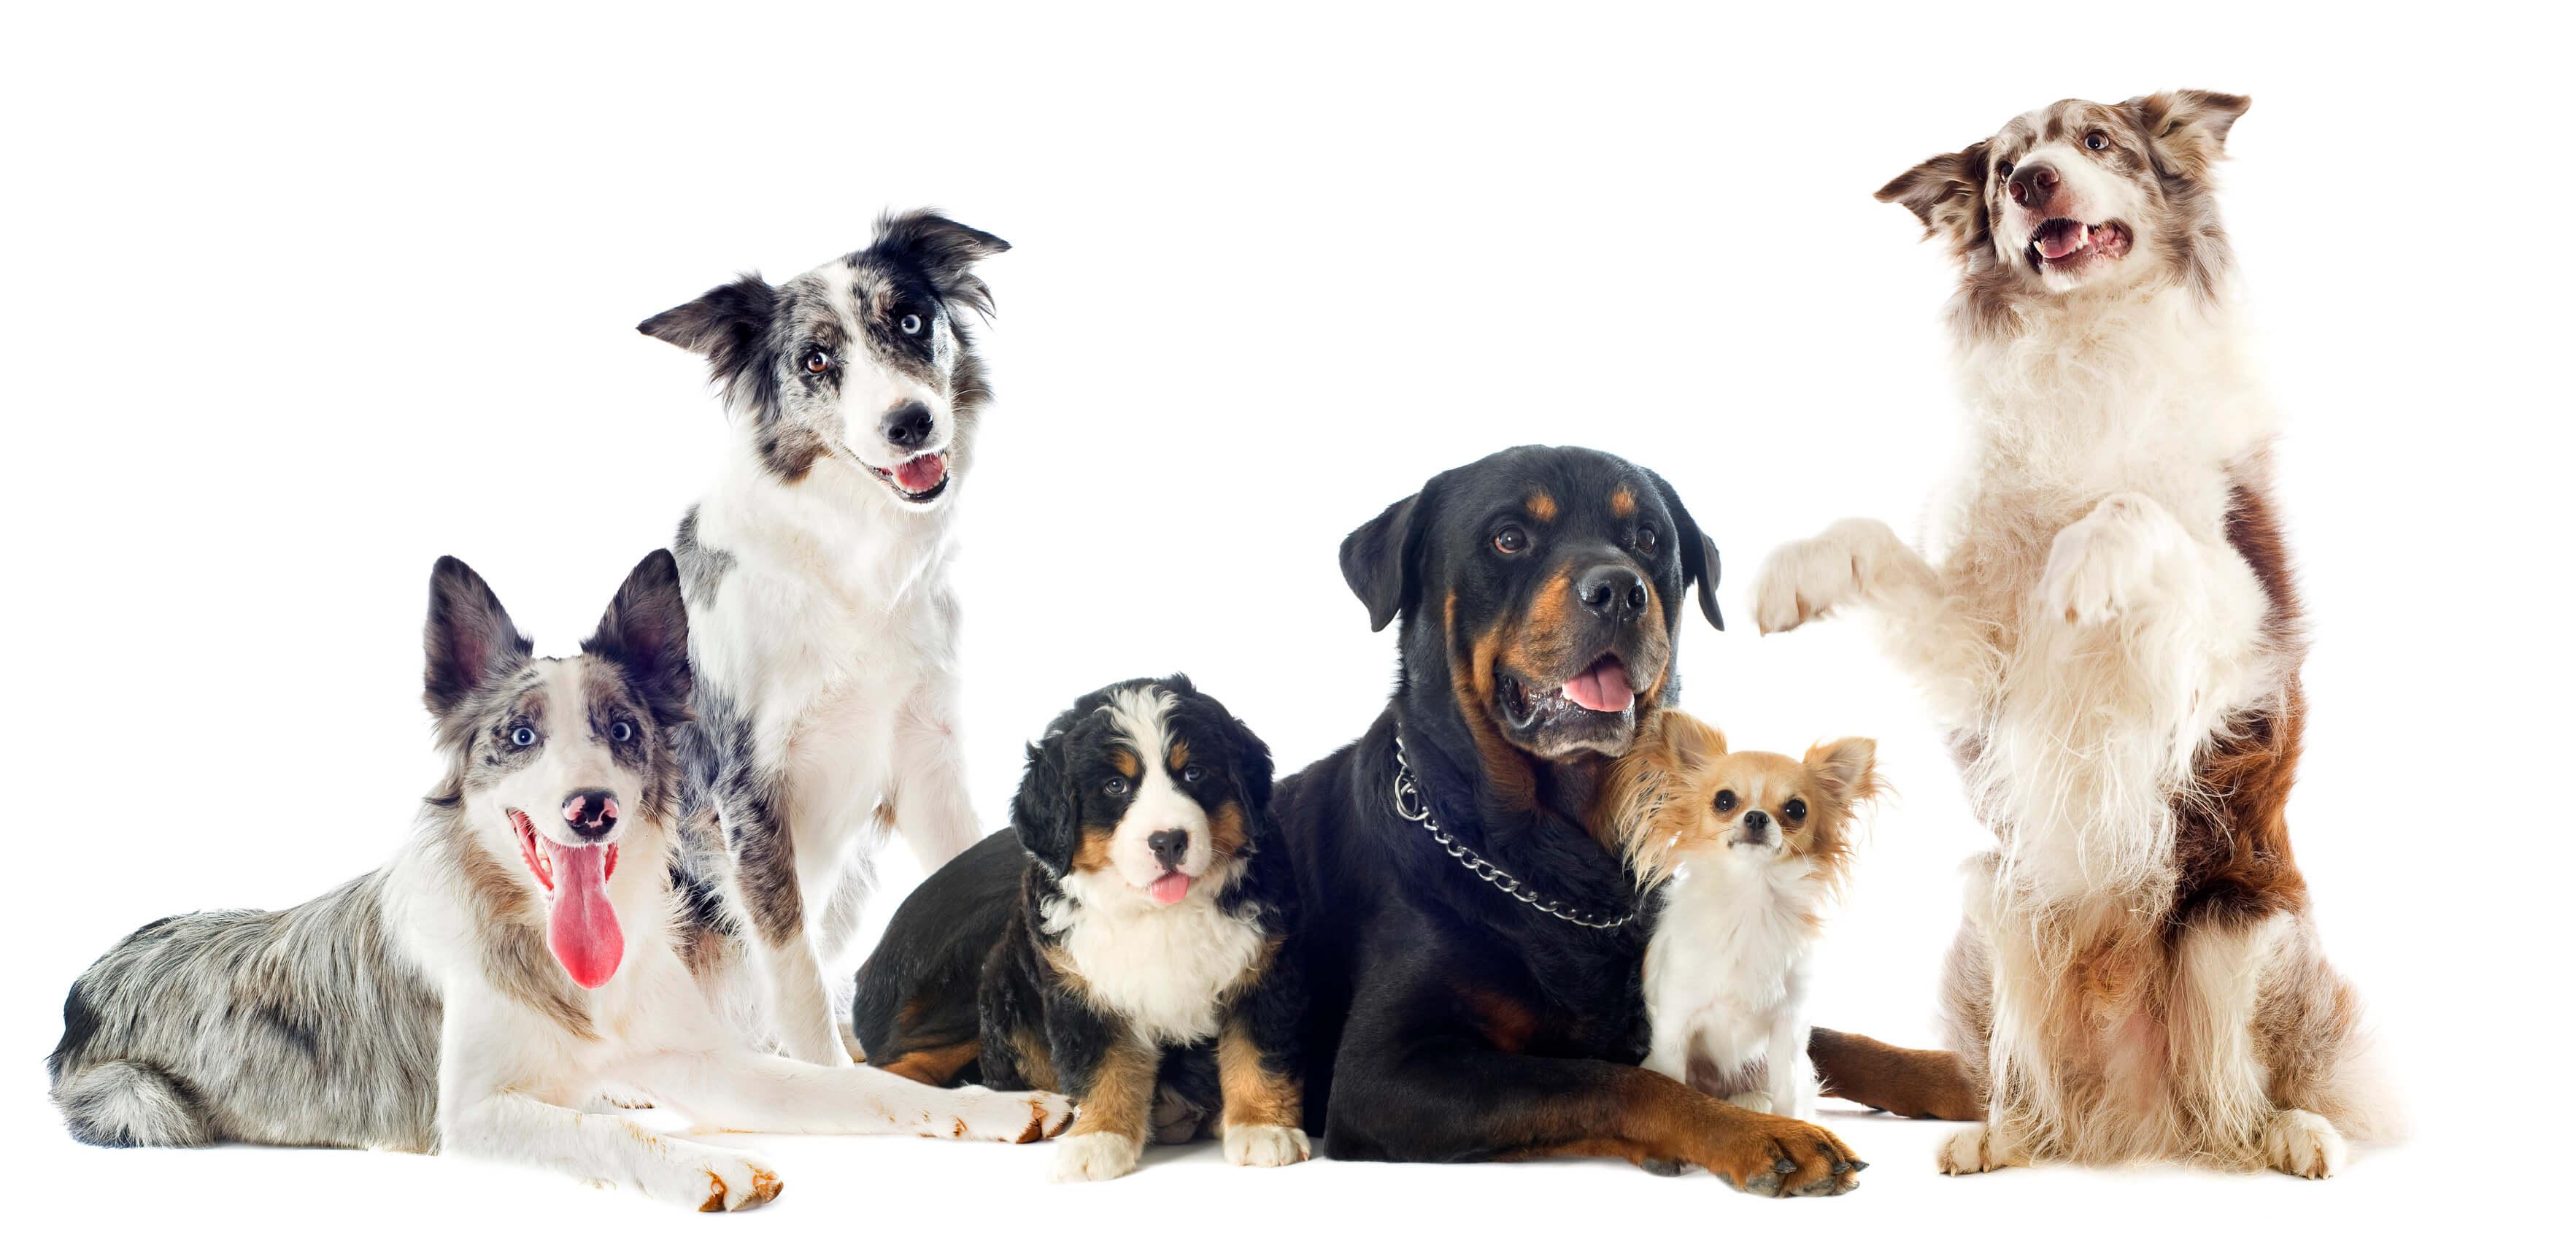 Crocchette per Can e Mangime per Cani - DOG Performance®